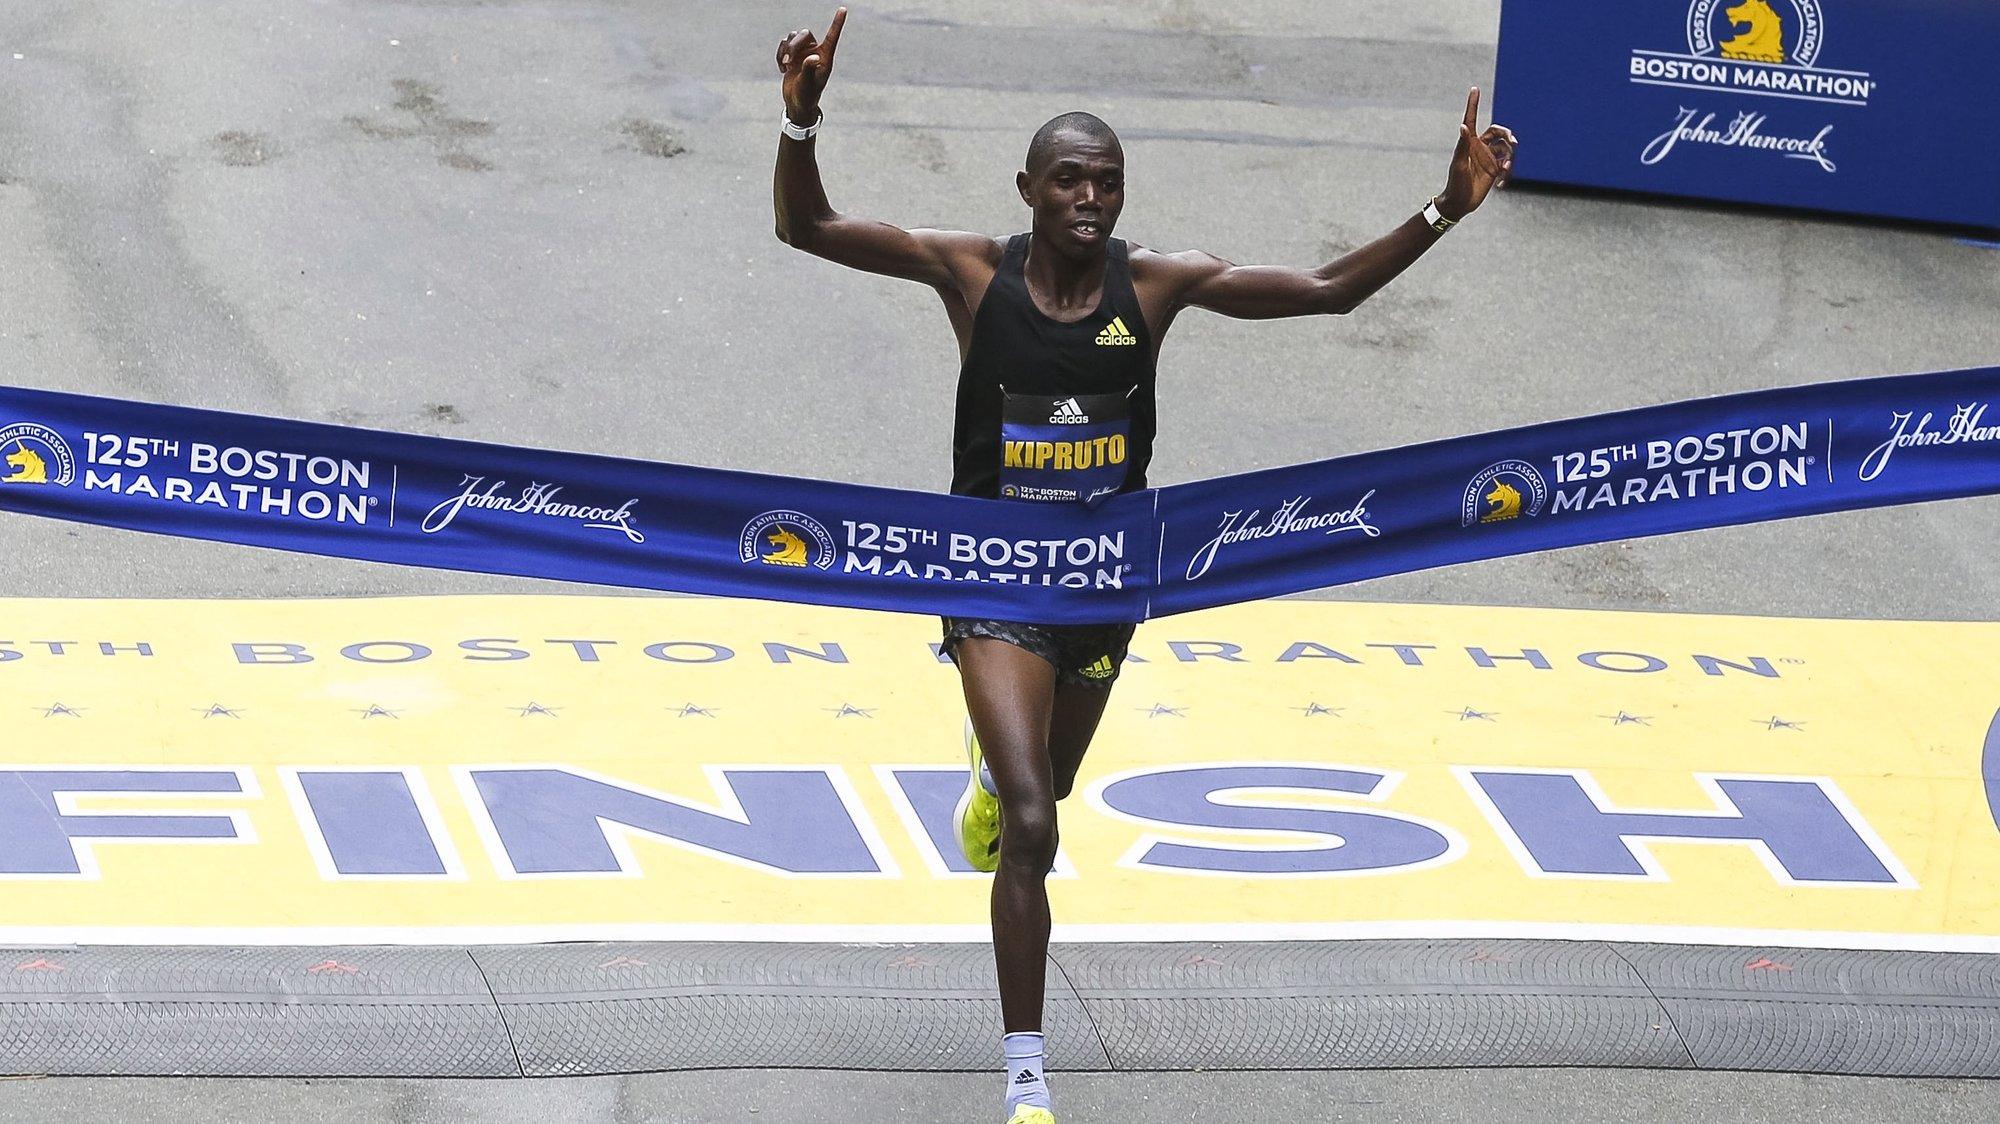 epa09518844 Benson Kipruto of Kenya crosses the finish line in first place to win the men's race of the 125th Boston Marathon in Boston, Massachusetts, USA, 11 October 2021.  EPA/HERB SWANSON